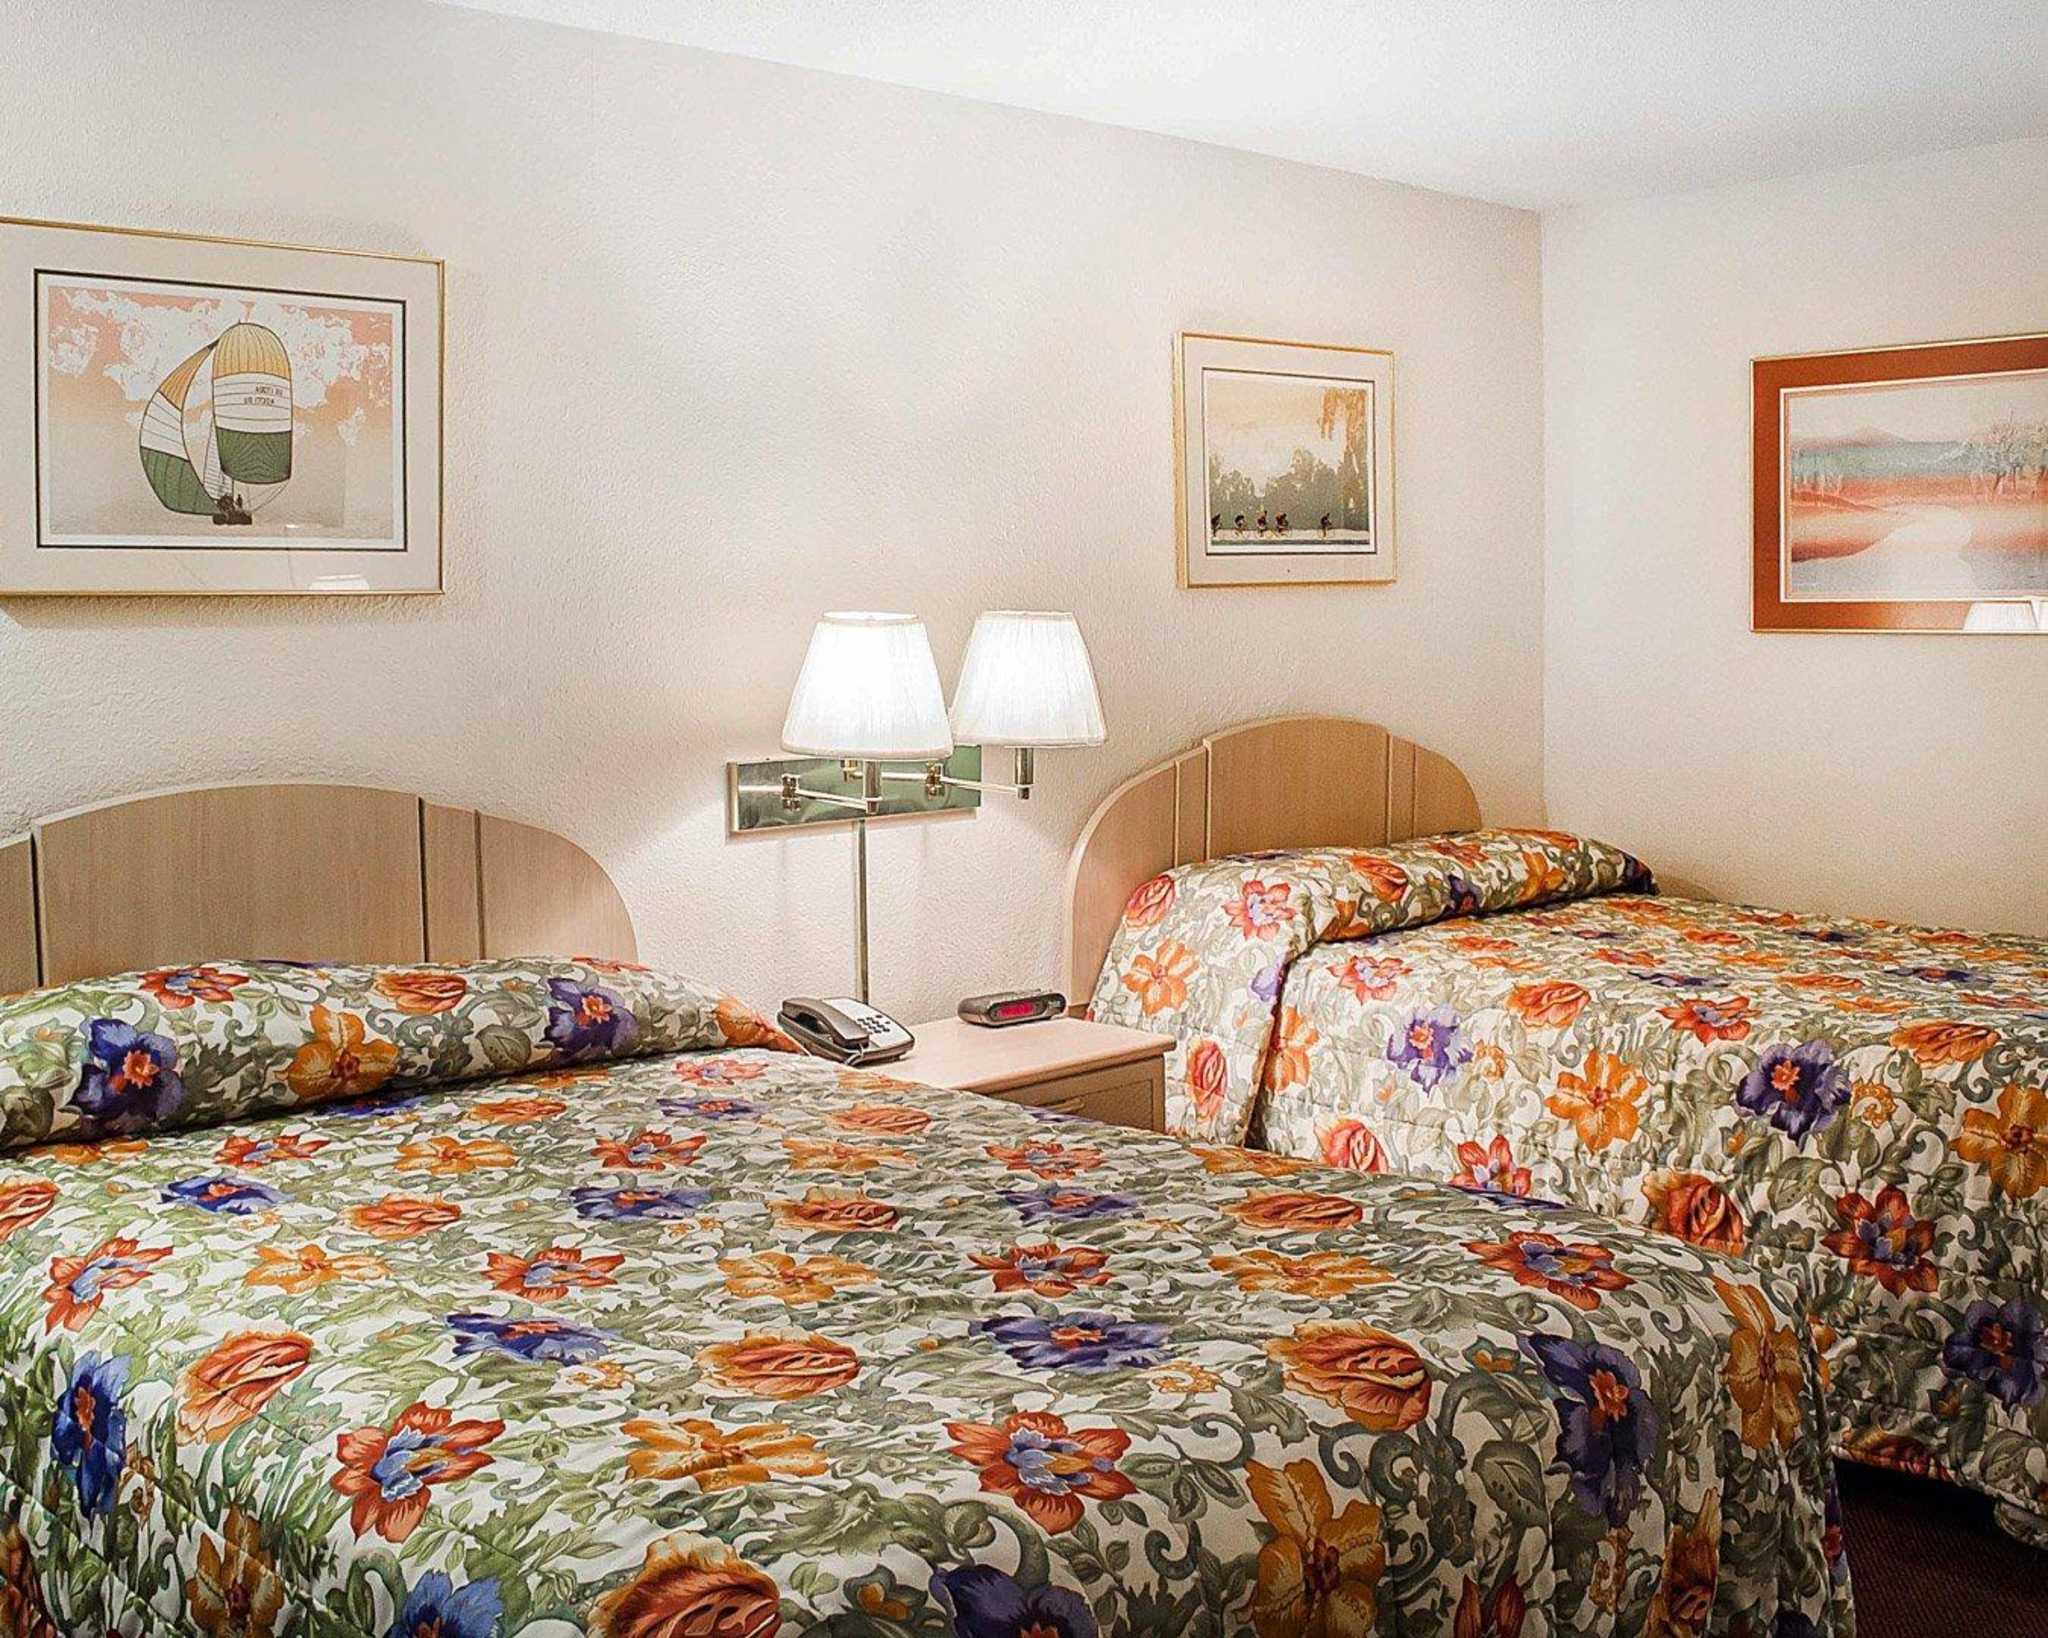 Rodeway Inn image 4